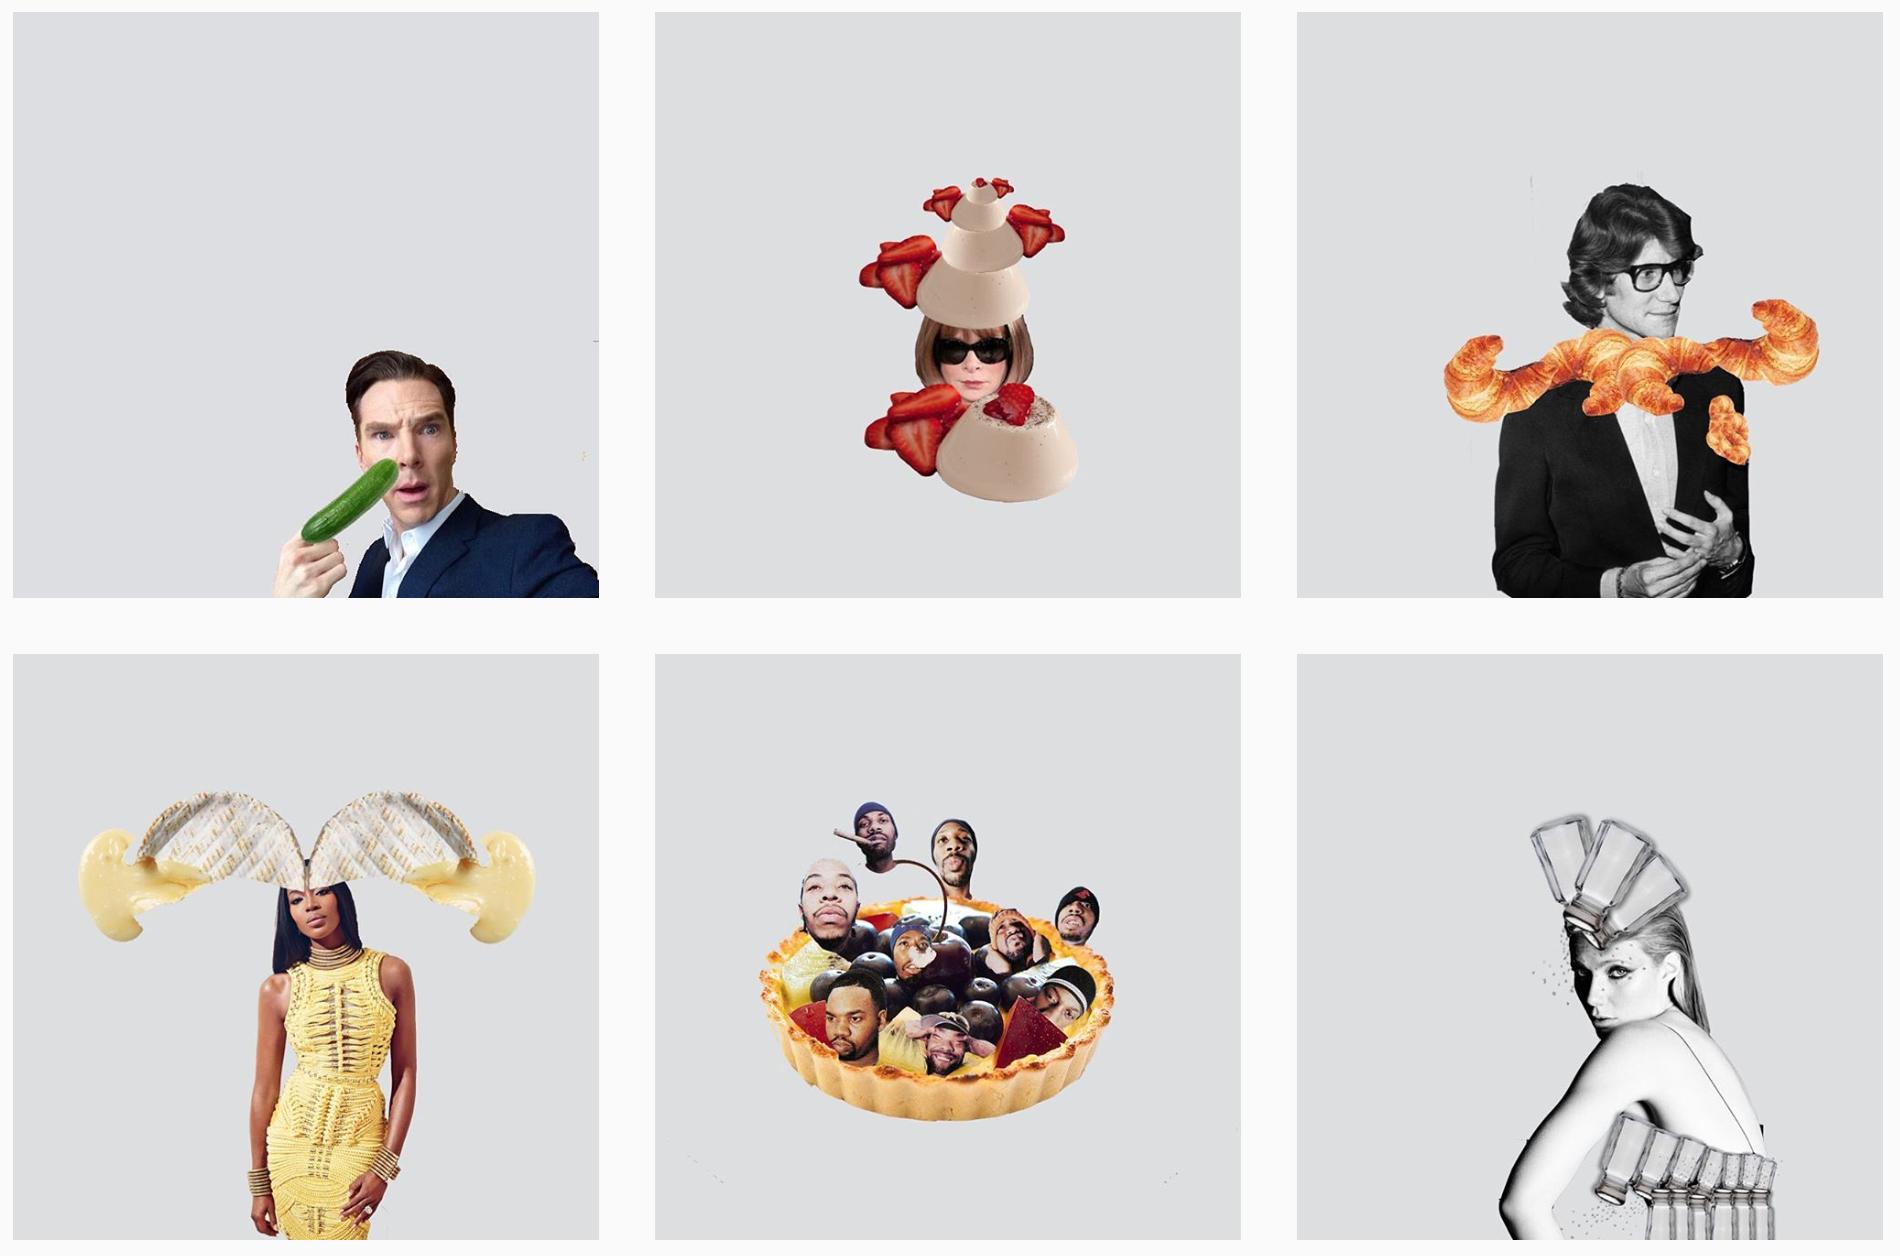 instagram/famous_food